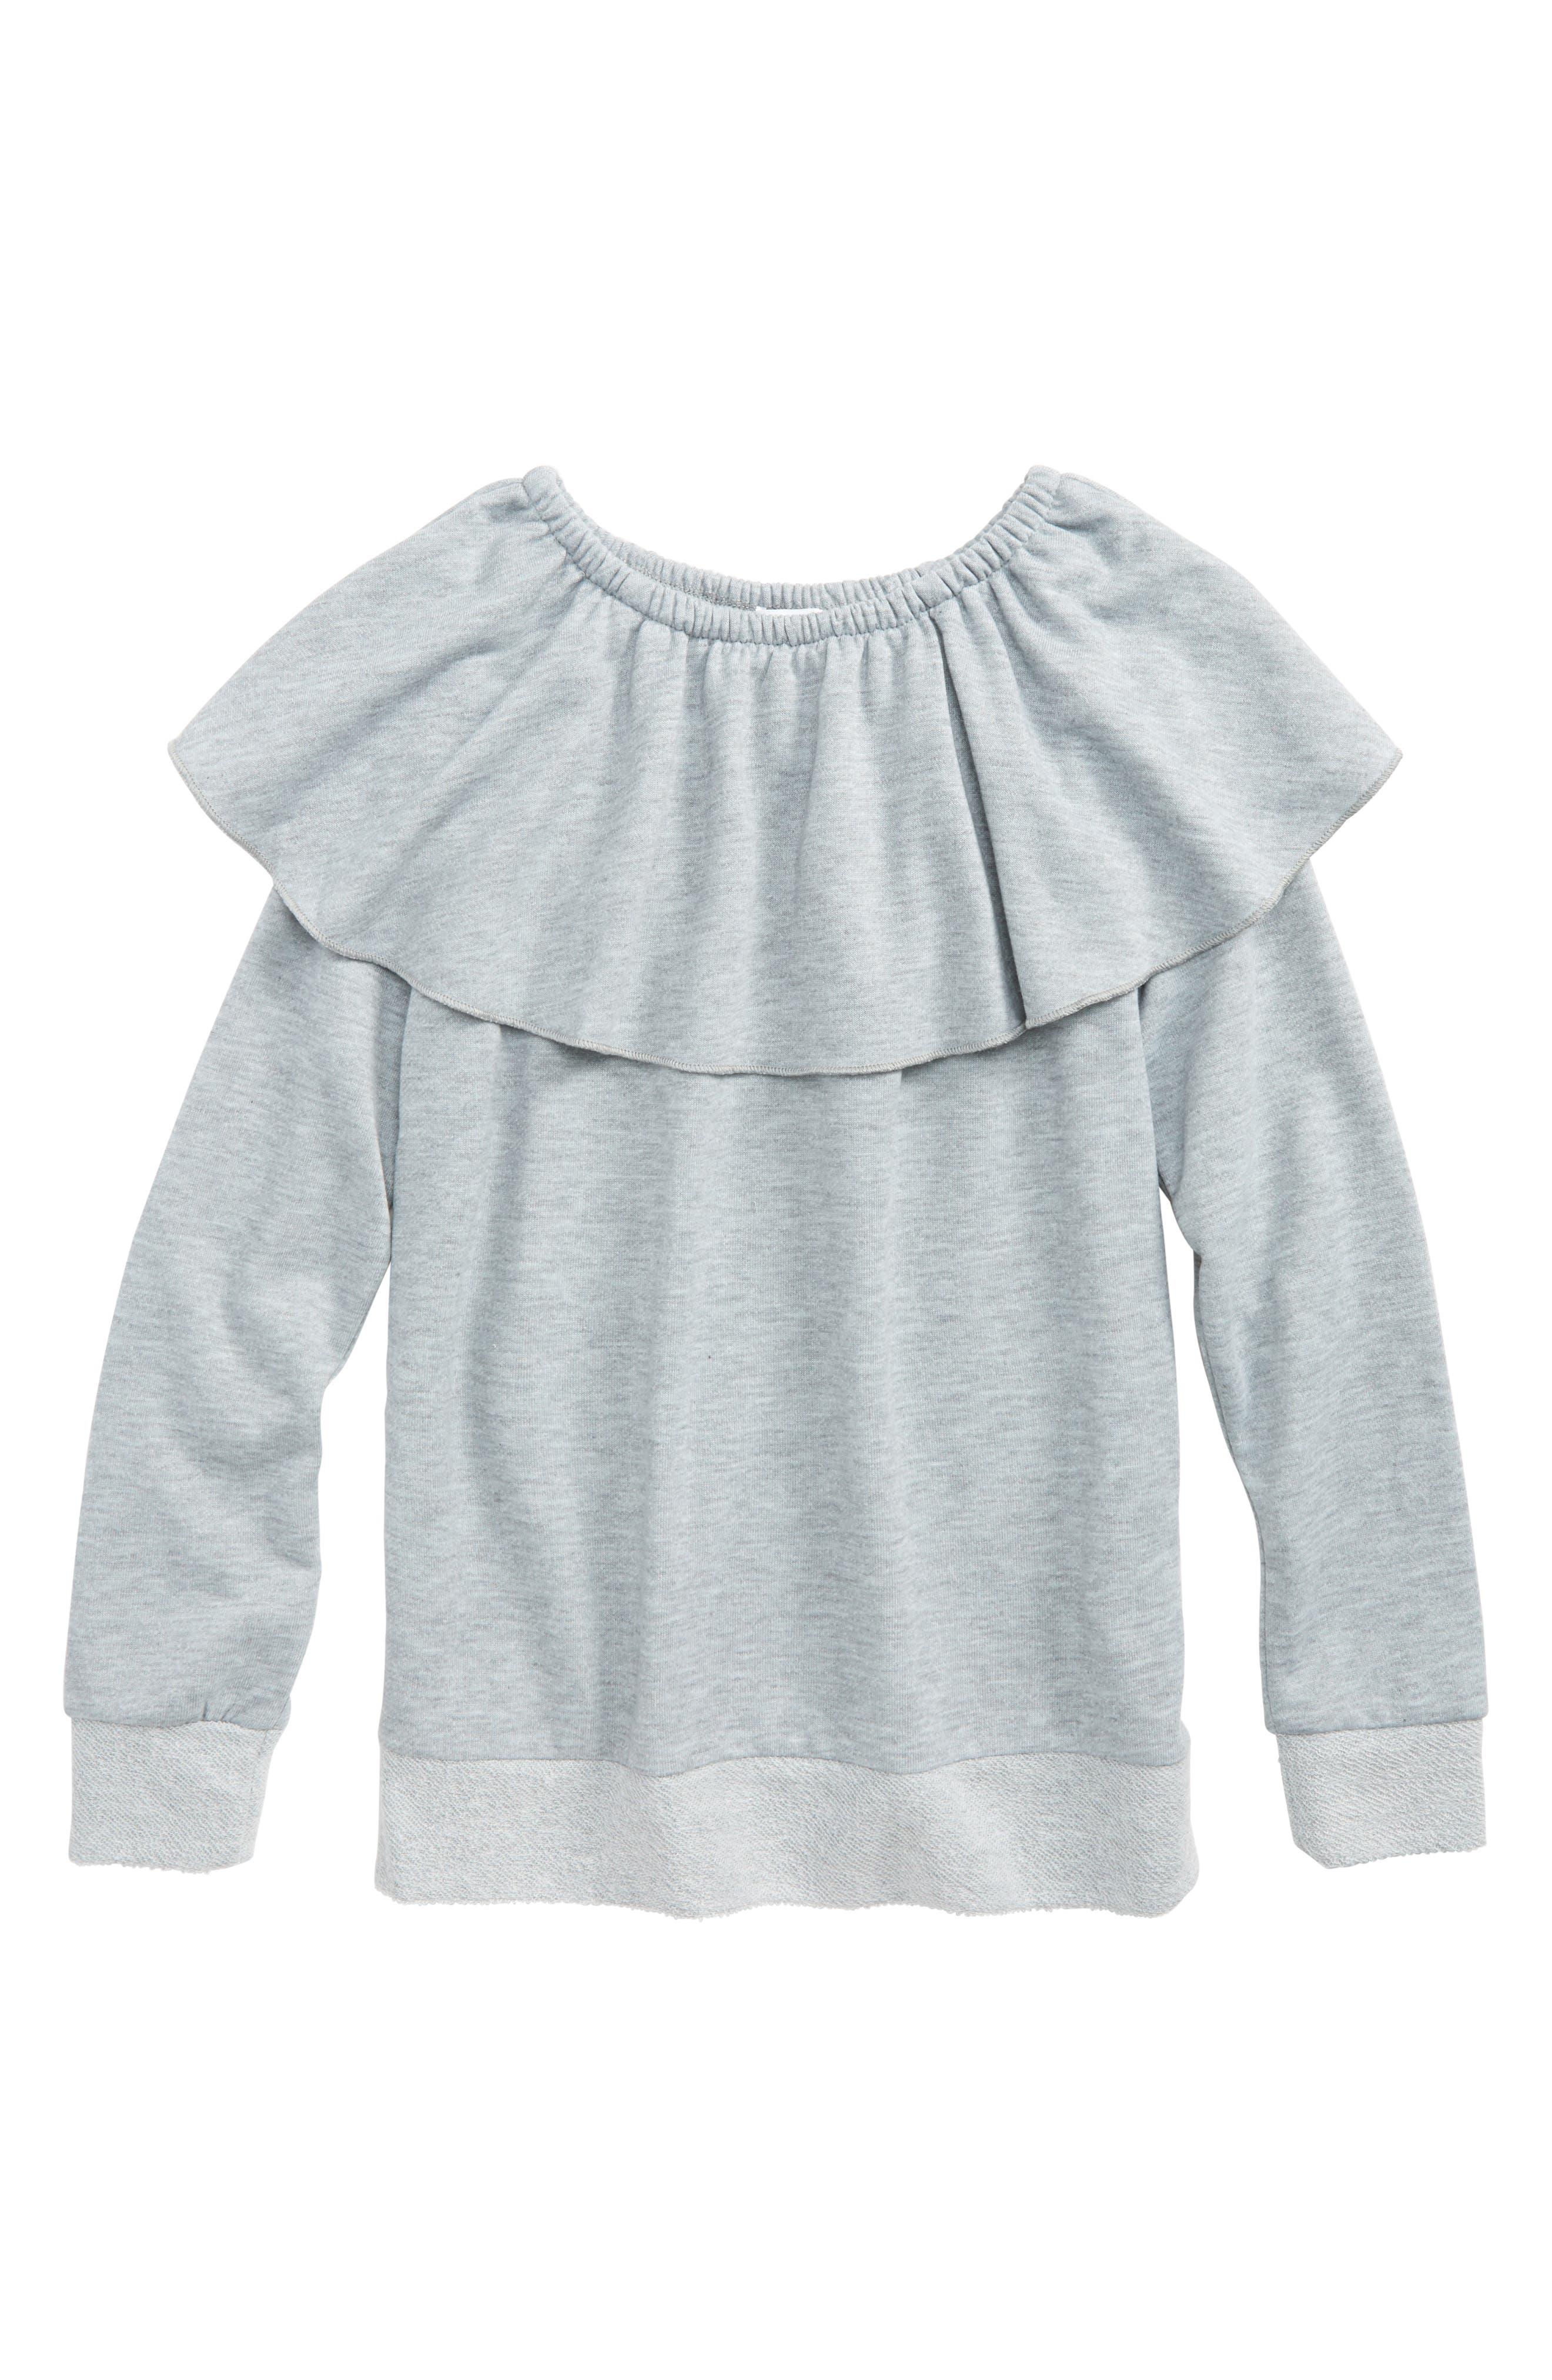 Ruffle French Terry Sweatshirt,                         Main,                         color,